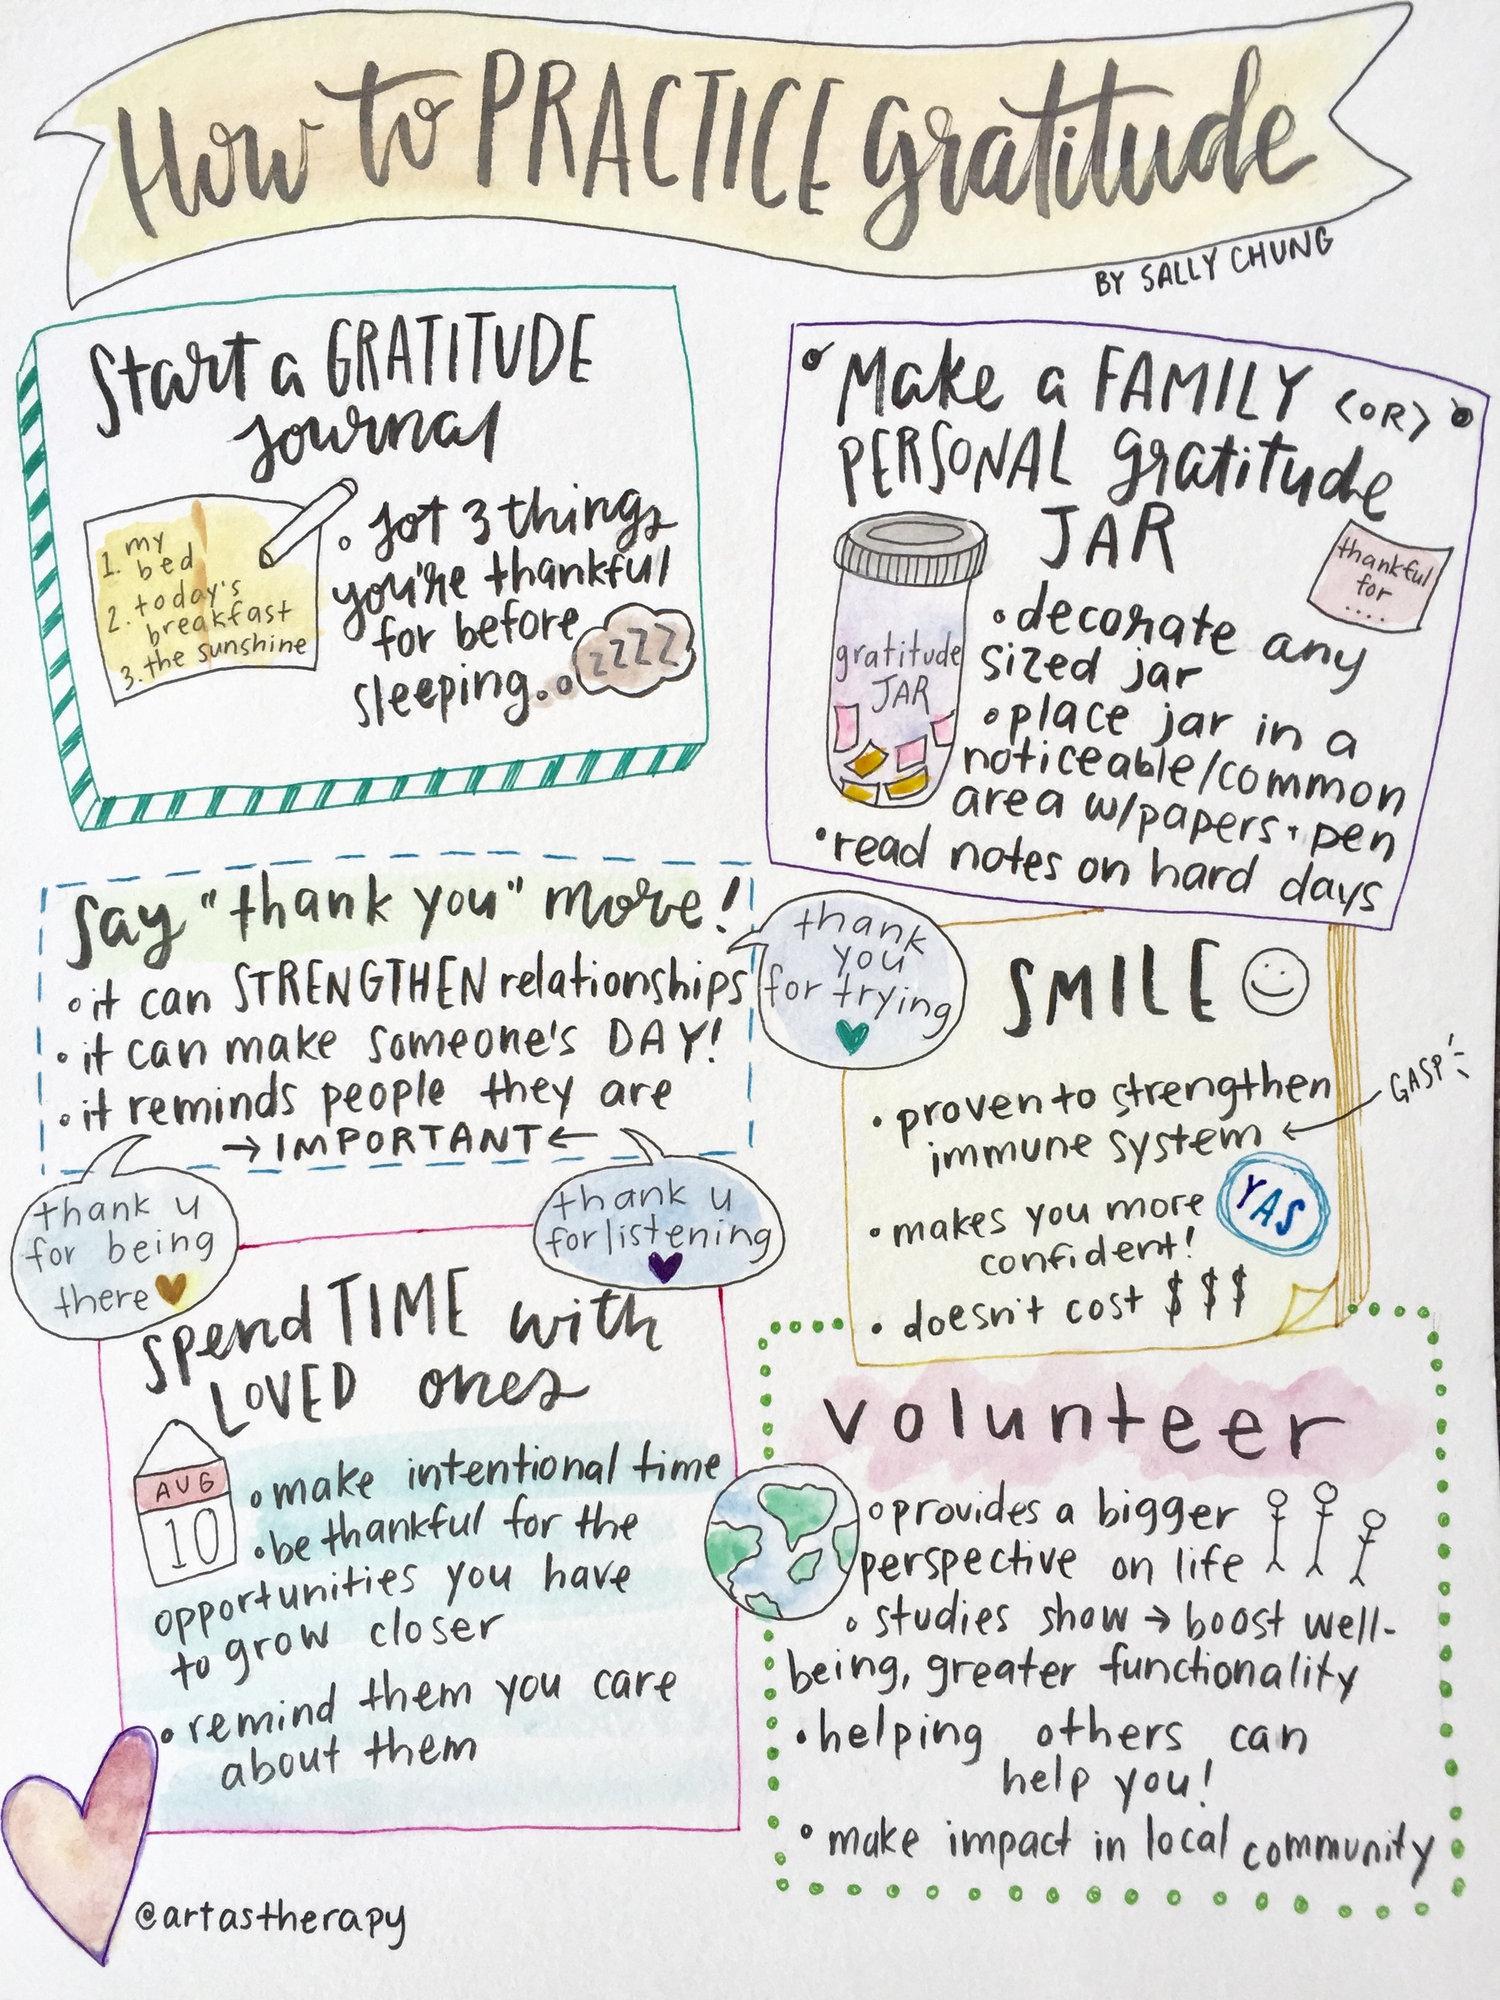 How to Practice Gratitude to Enjoy Life